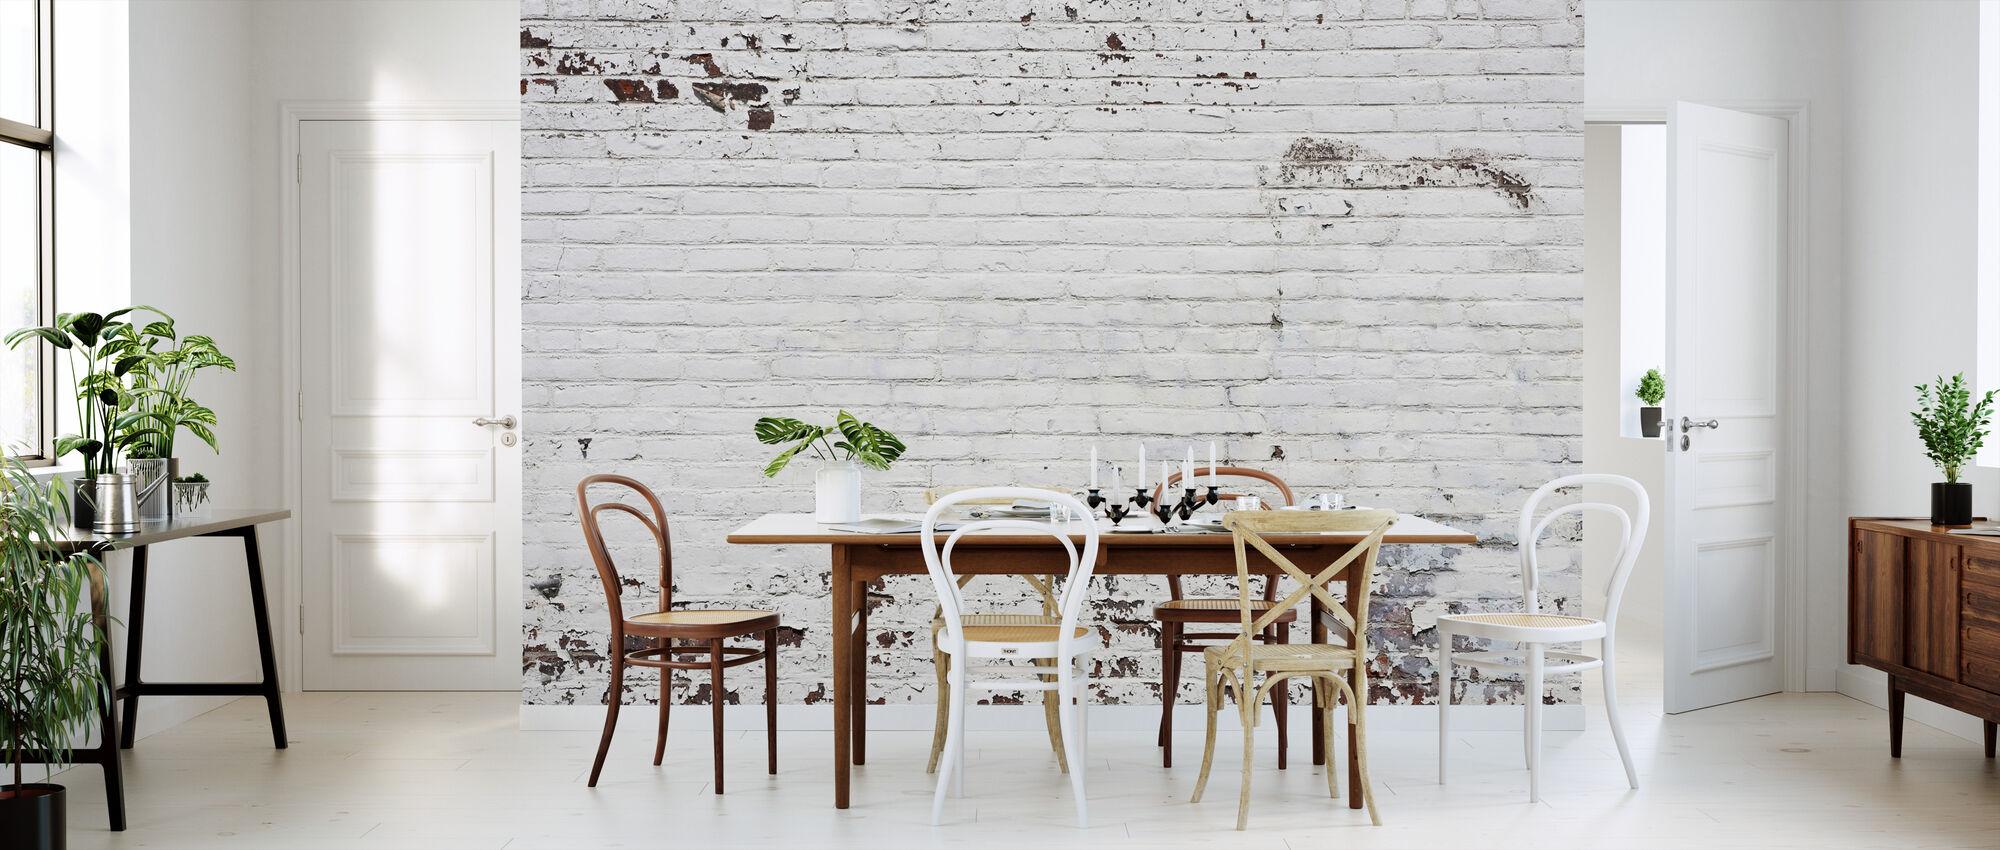 Old Brick Wall - Wallpaper - Kitchen